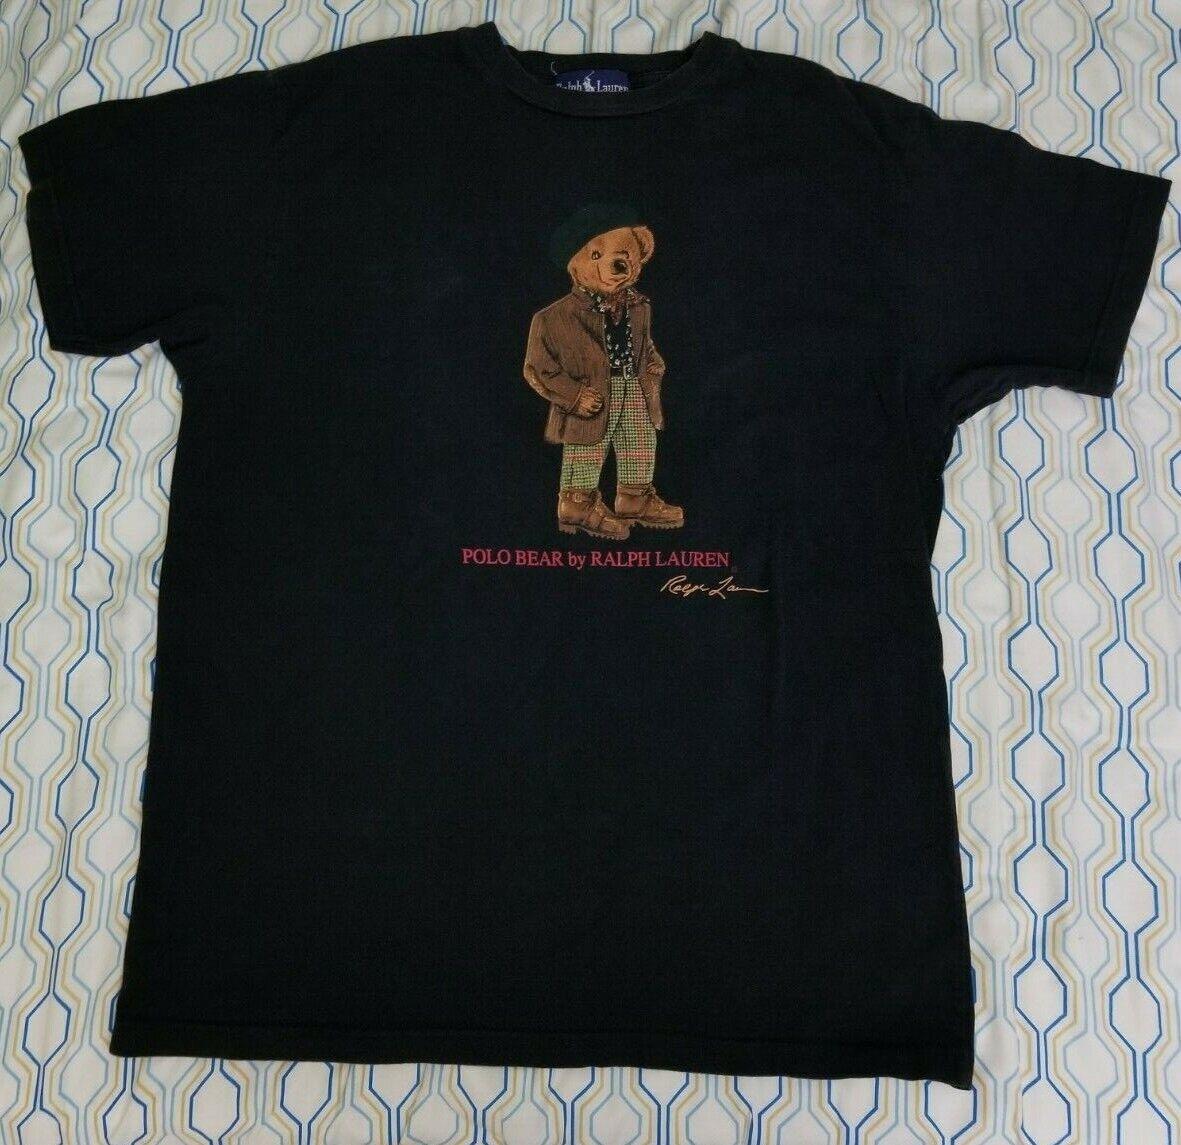 VTG 80s 90s Polo Ralph Lauren Polo Bear T Shirt B… - image 3